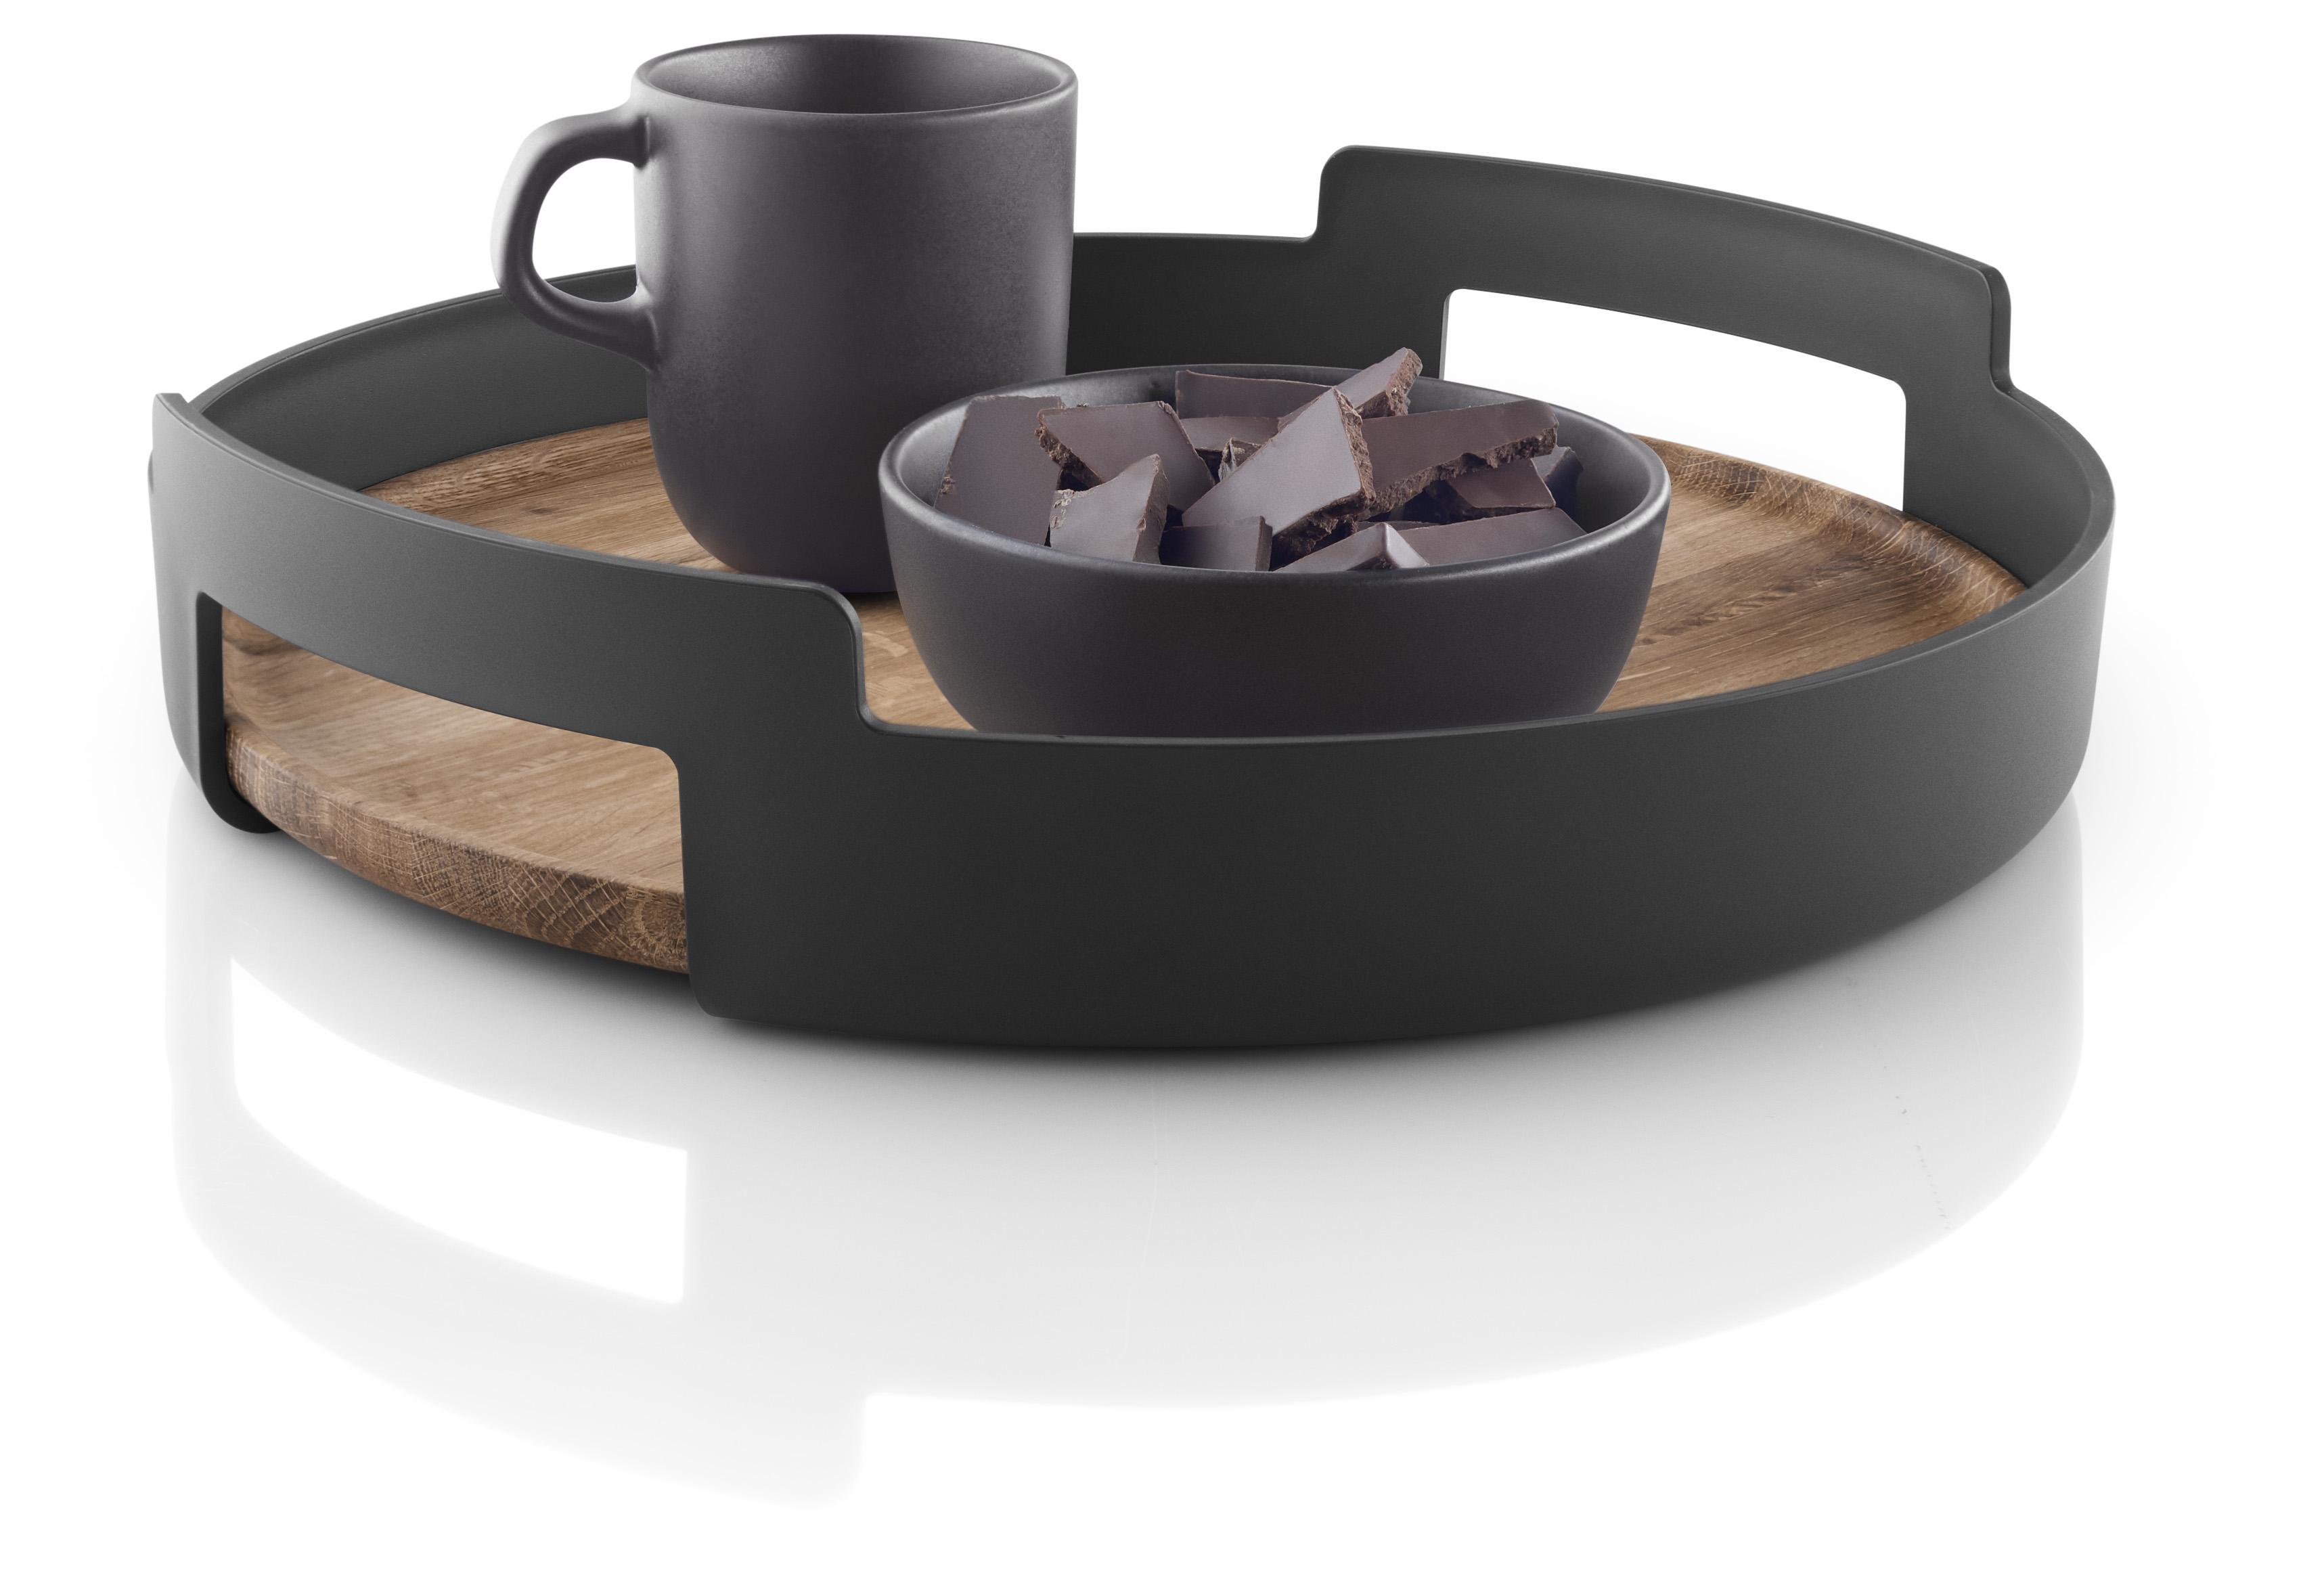 Eva Solo - Nordic Kitchen Serving Tray (520416)